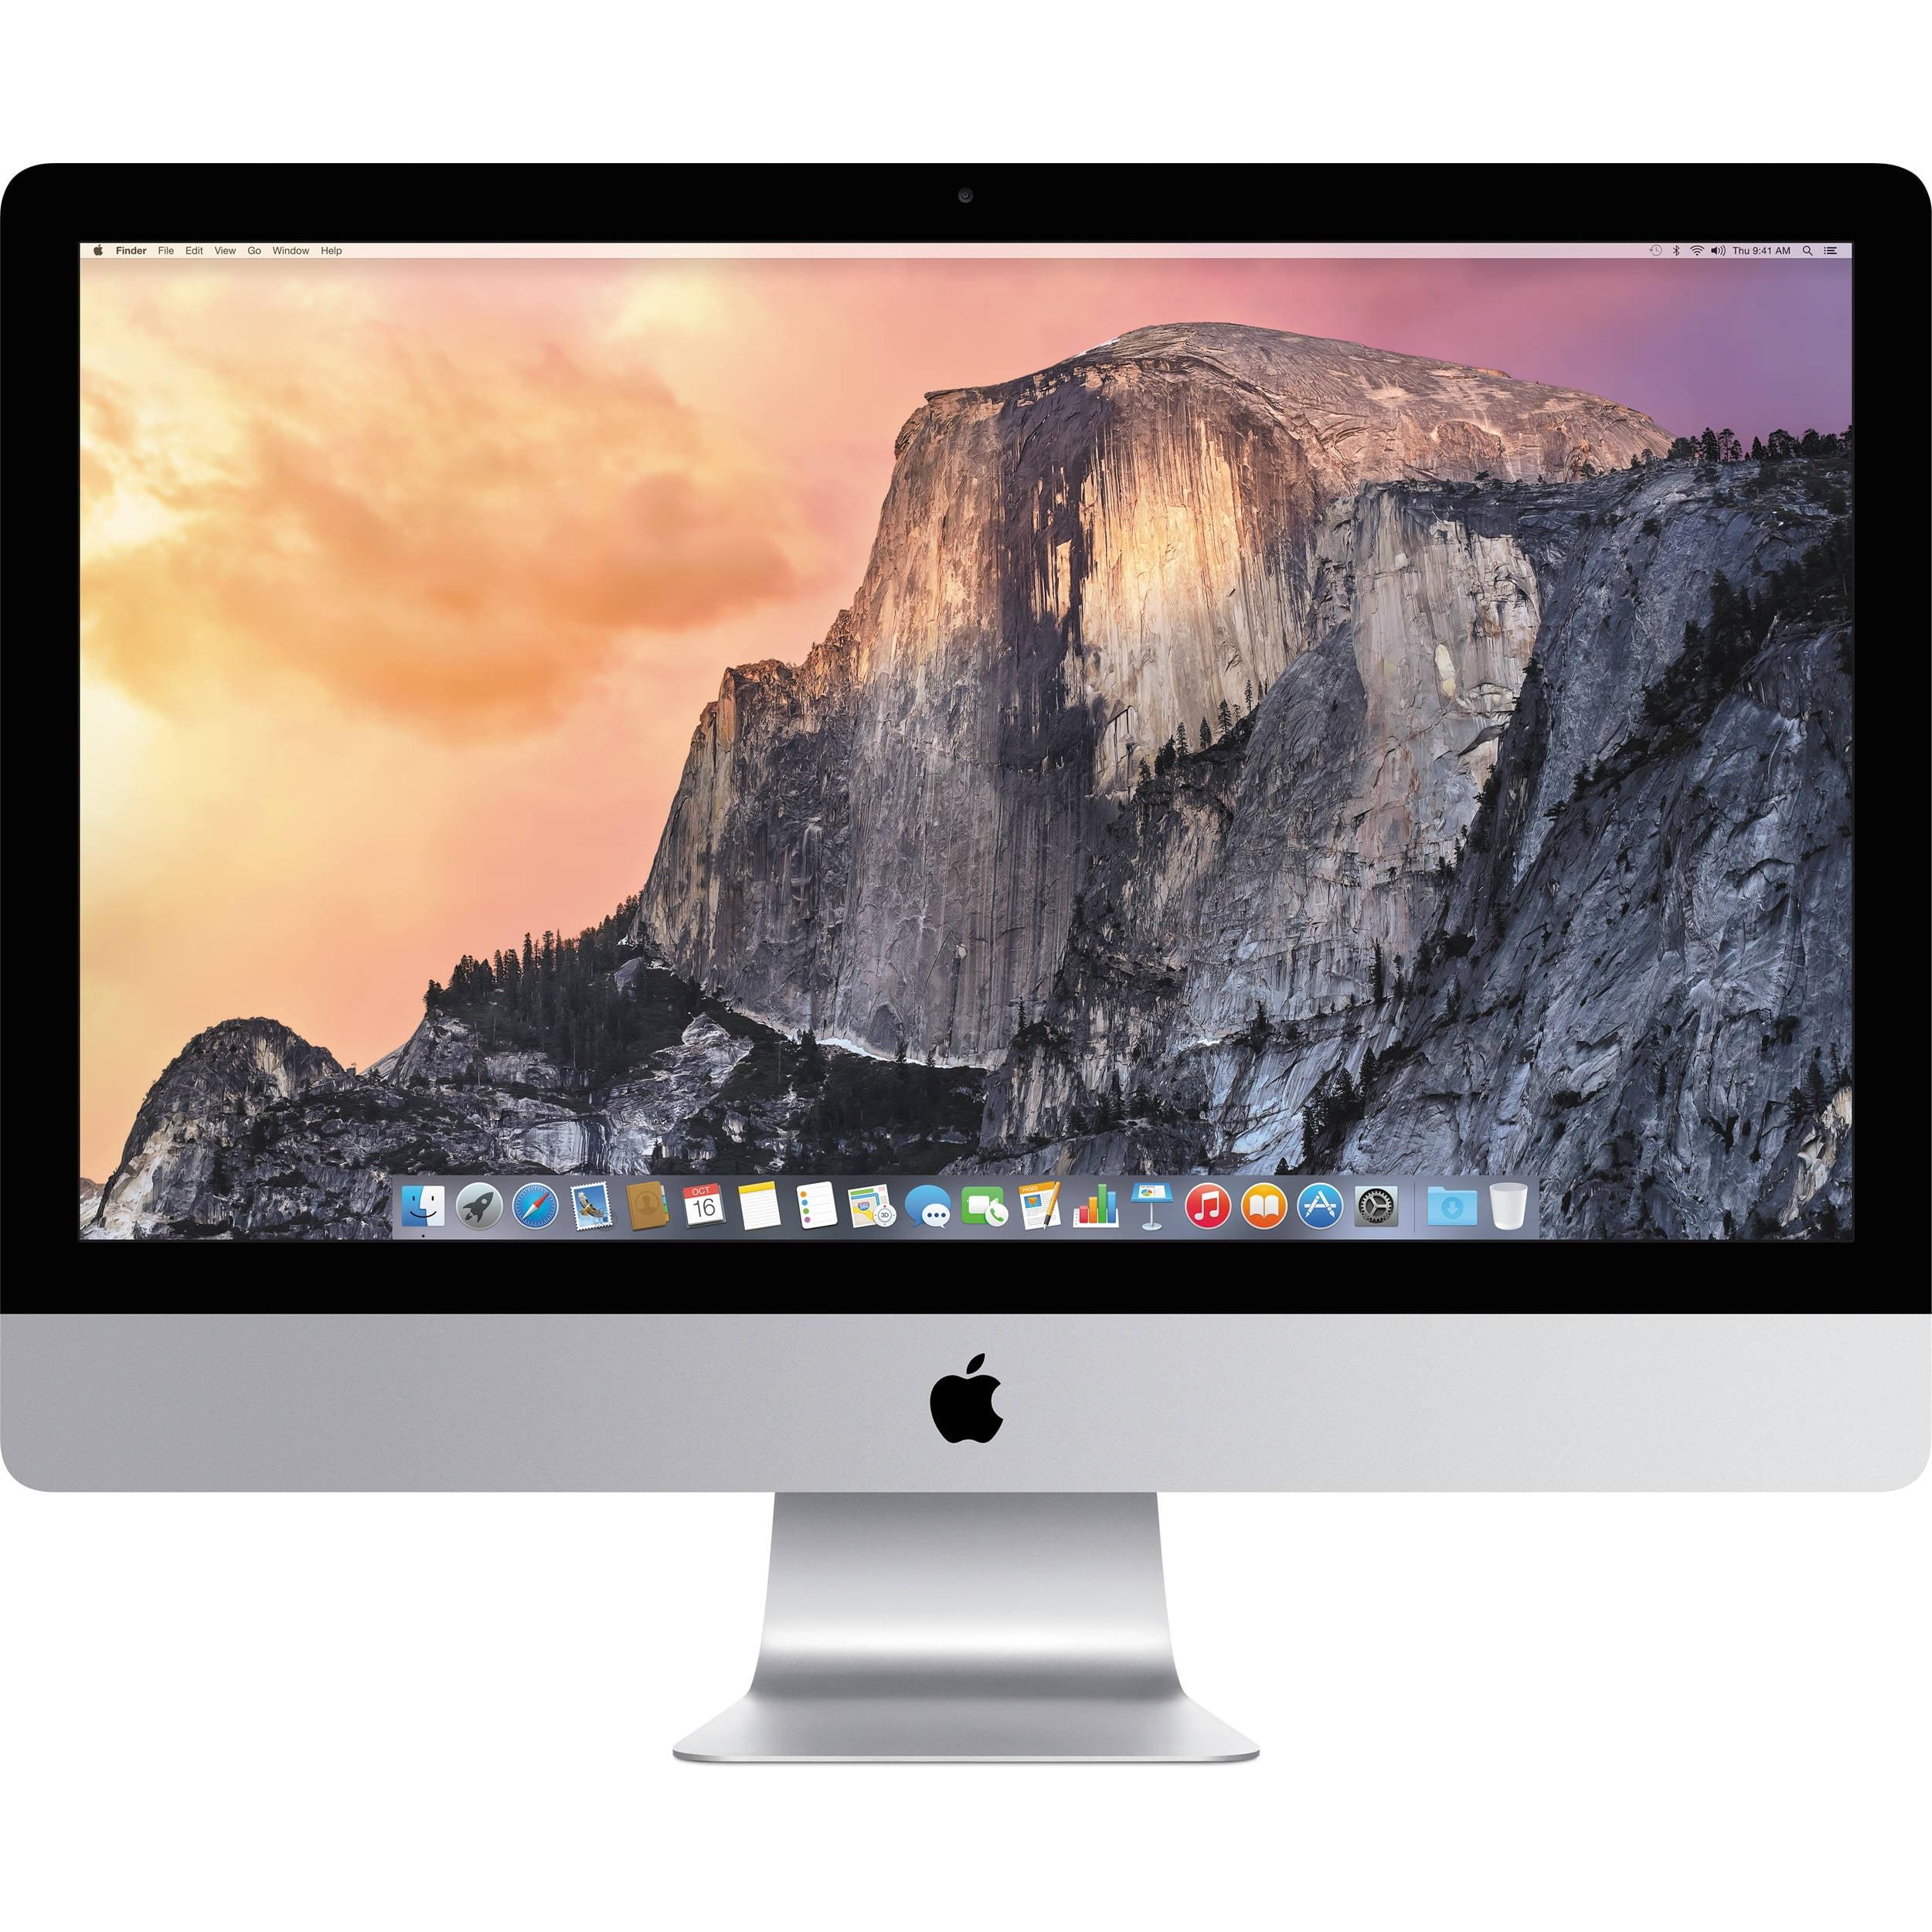 "Apple iMac MF885LL/A 27"" Intel Core i5-4590 X4 3.3GHz 8GB 1TB, Silver (Scratch And Dent Refurbished)"